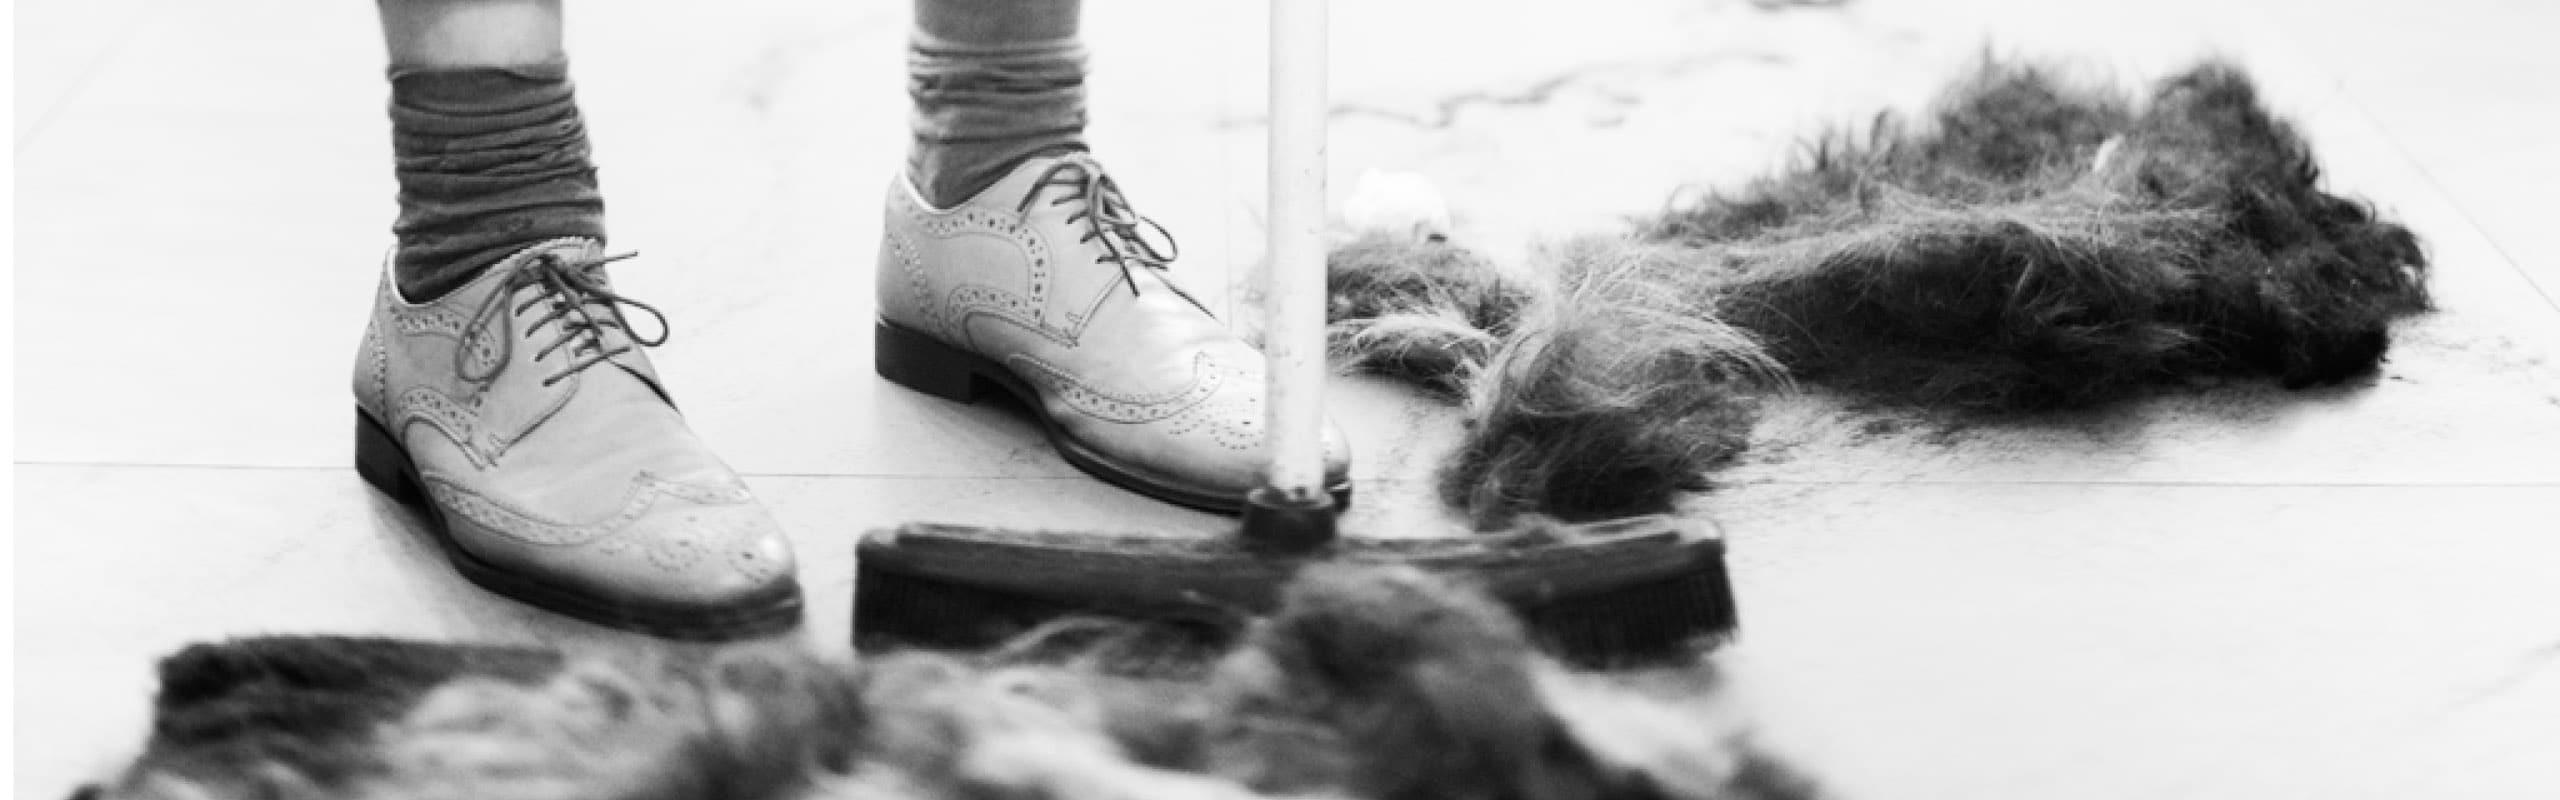 coiffeur lyon, 2nd-face, salon de coiffure lyon, coiffeur lyon 7, coiffeur coloriste lyon, coiffeur homme lyon, coiffeur bio, meilleurs coiffeurs lyon, lyon coiffeur, coiffeur villeurbanne, coiffeur lyon homme, coiffeur tendance lyon, coiffeur visagiste lyon, coiffeur sans rendez-vous, coiffeur lyon 4, barbier lyon, barber shop lyon, coloriste lyon, tresses lyon, architecture lyon, design lyon, concept store lyon, coloration végétale lyon, mèches lyon, lyon shop and design, coiffeur lyon 2, coiffeur lyon 7, coiffeur lyon 1